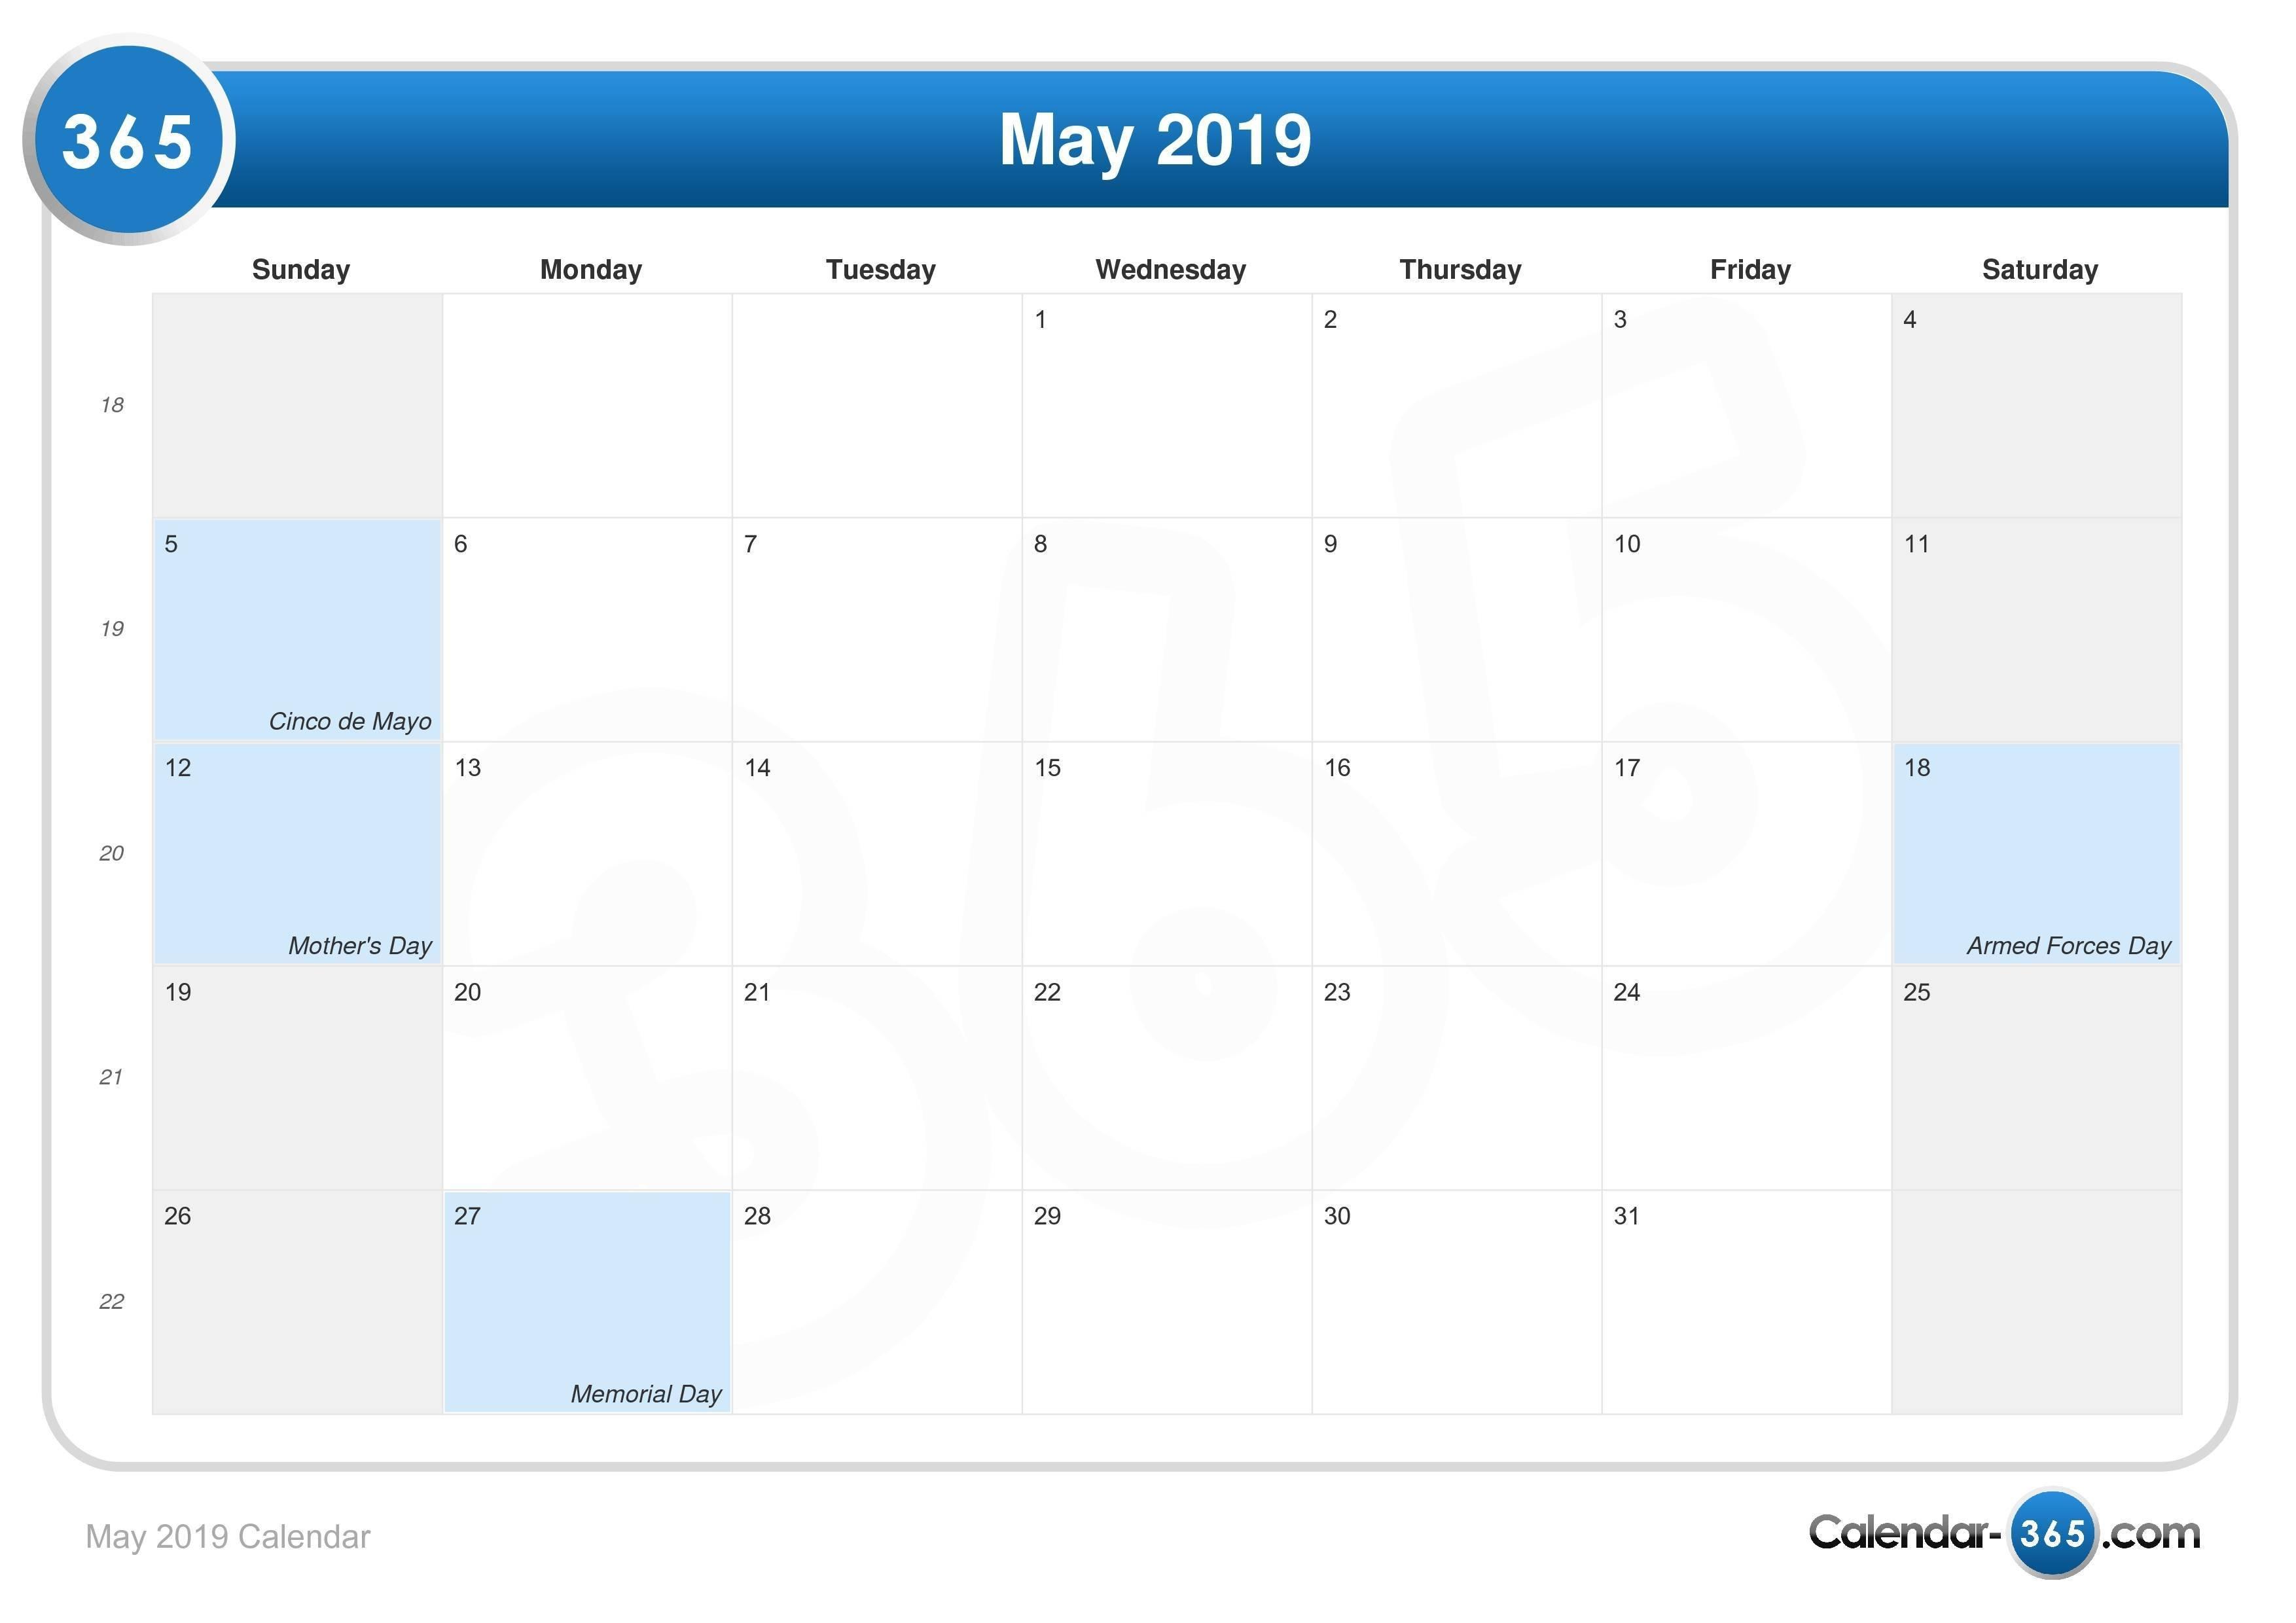 May 2019 Calendar 9/2019 Calendar